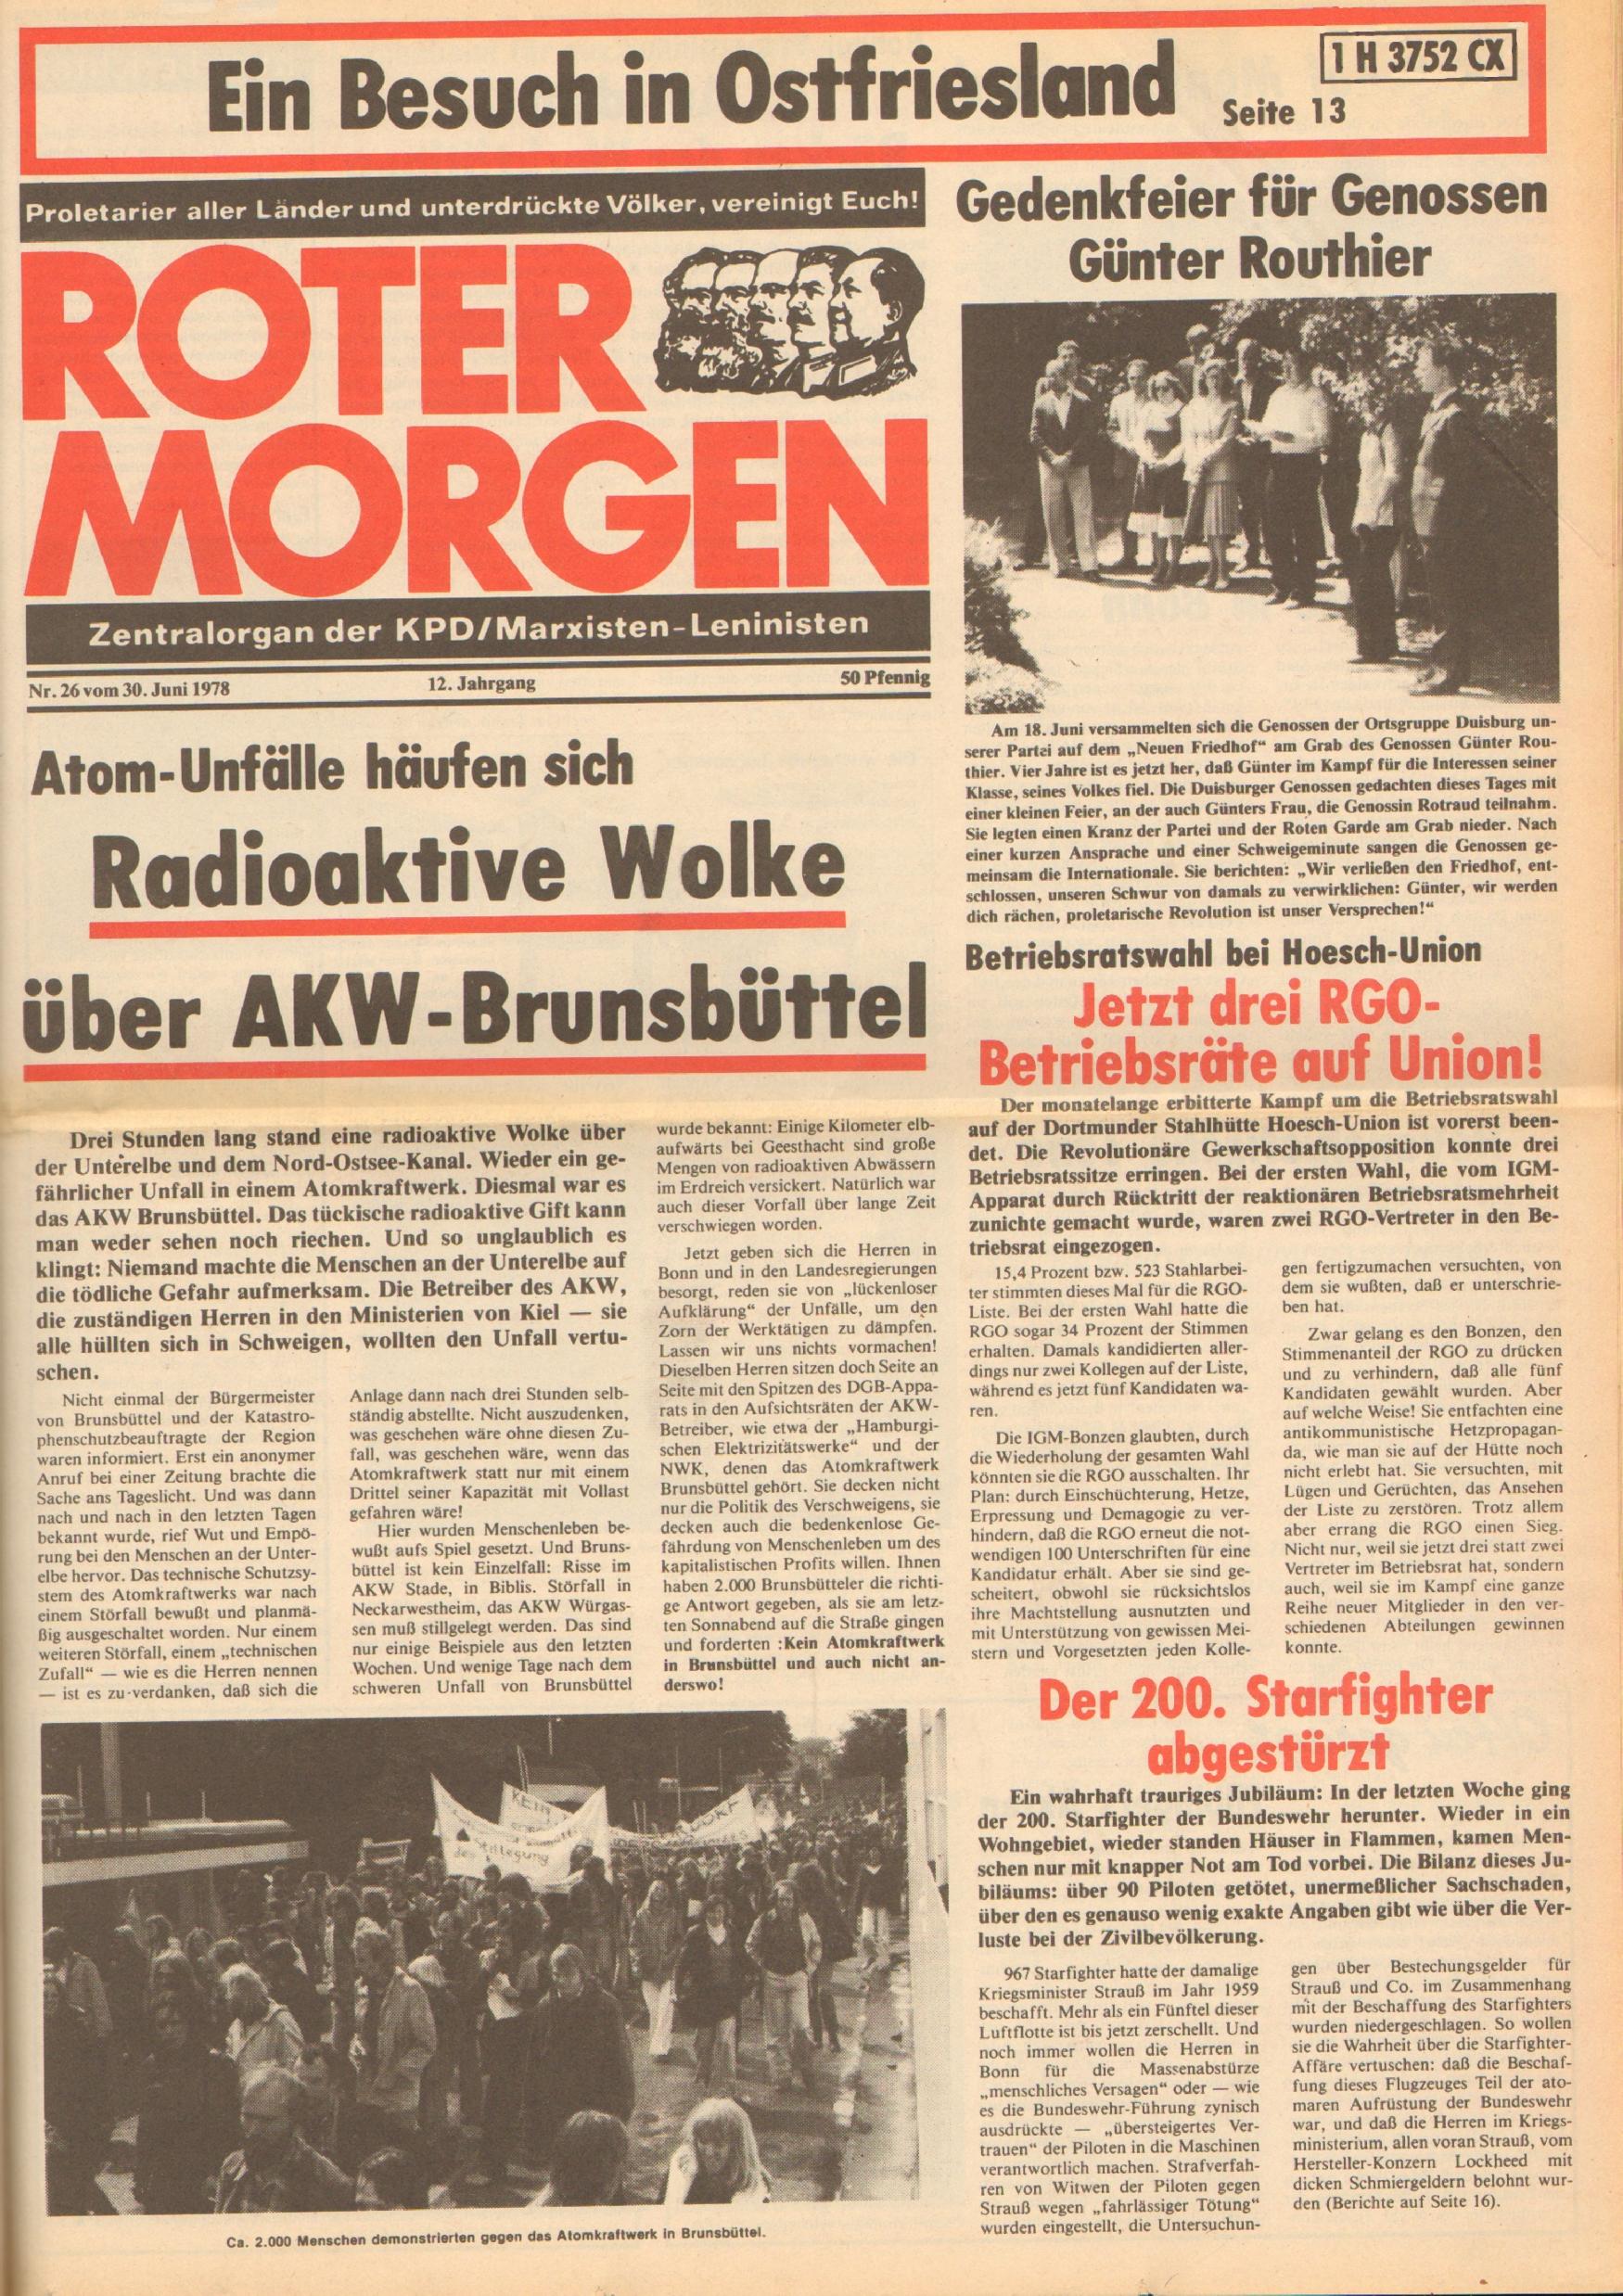 Roter Morgen, 12. Jg., 30. Juni 1978, Nr. 26, Seite 1